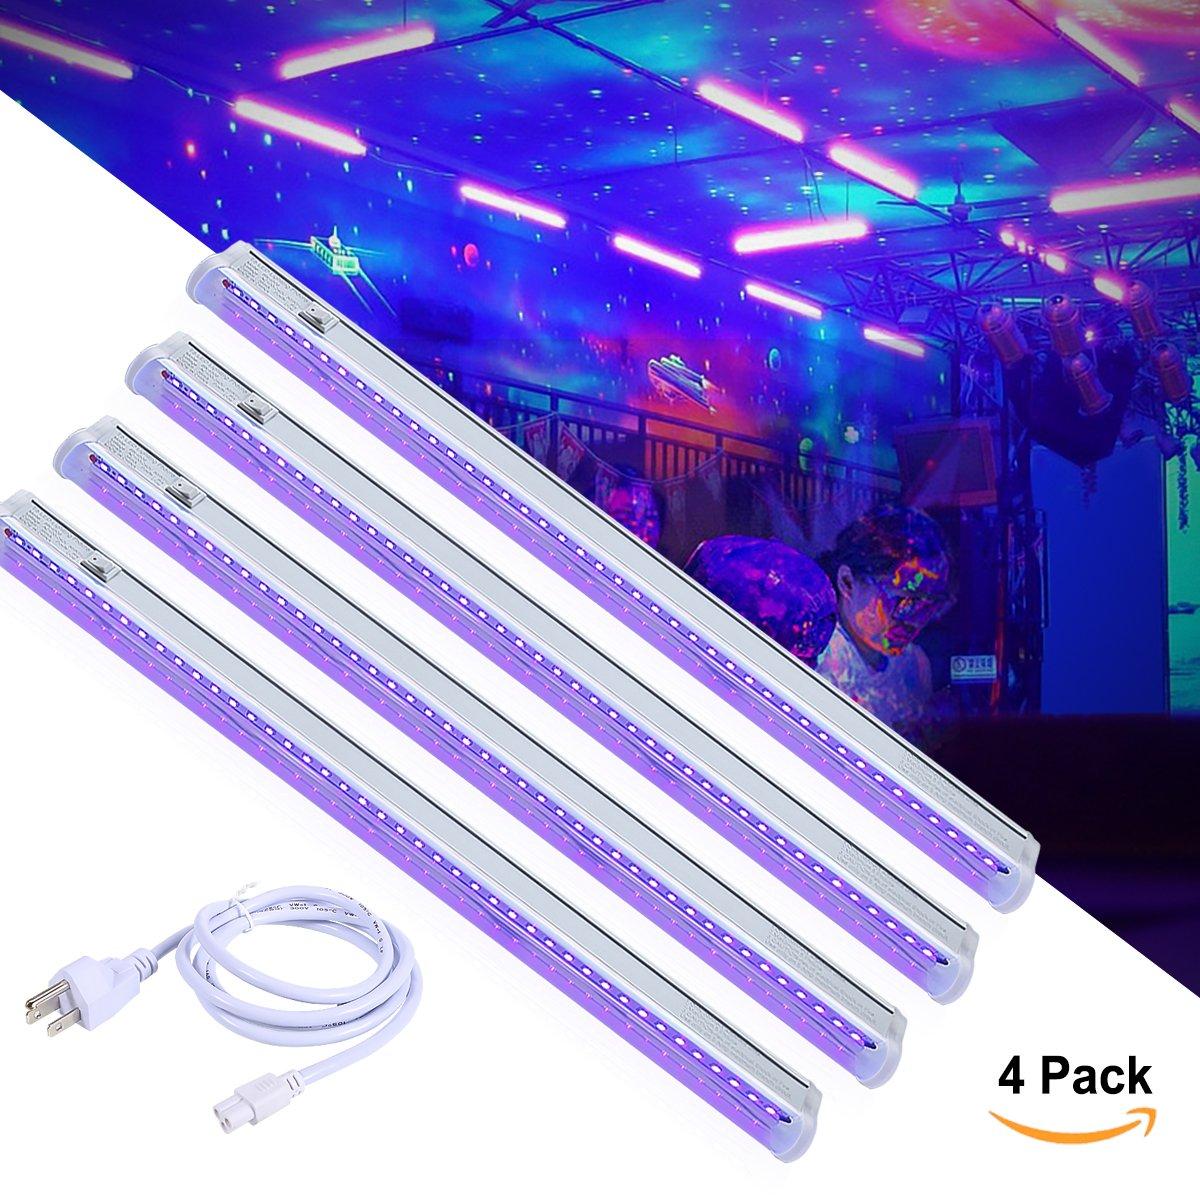 T5 UV LED Black Light Bar Fixtures Built-in ON/Off Switch, Greenclick 4 Pack DJ Blacklight Bar Safe Party UV Light, 24W, UL Listed Plug